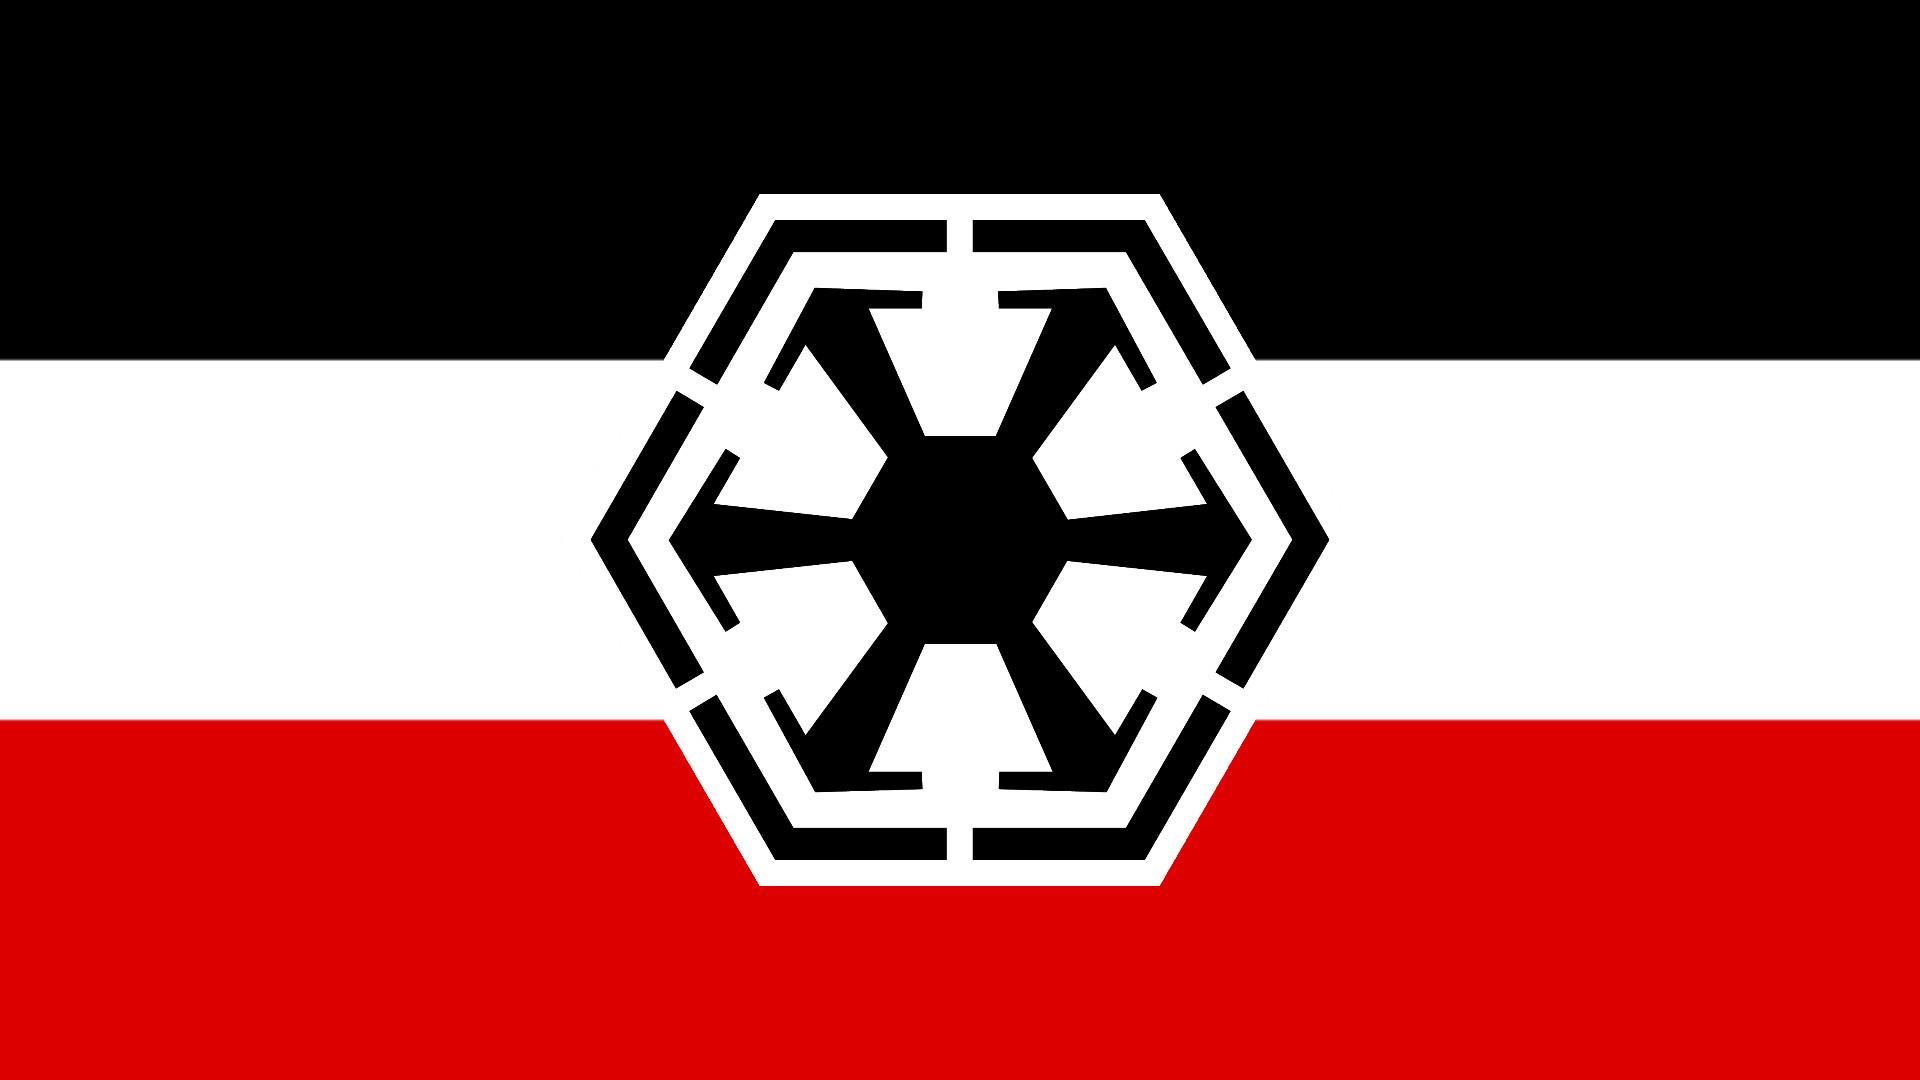 … SWTOR Sith Empire Flag by uda4754